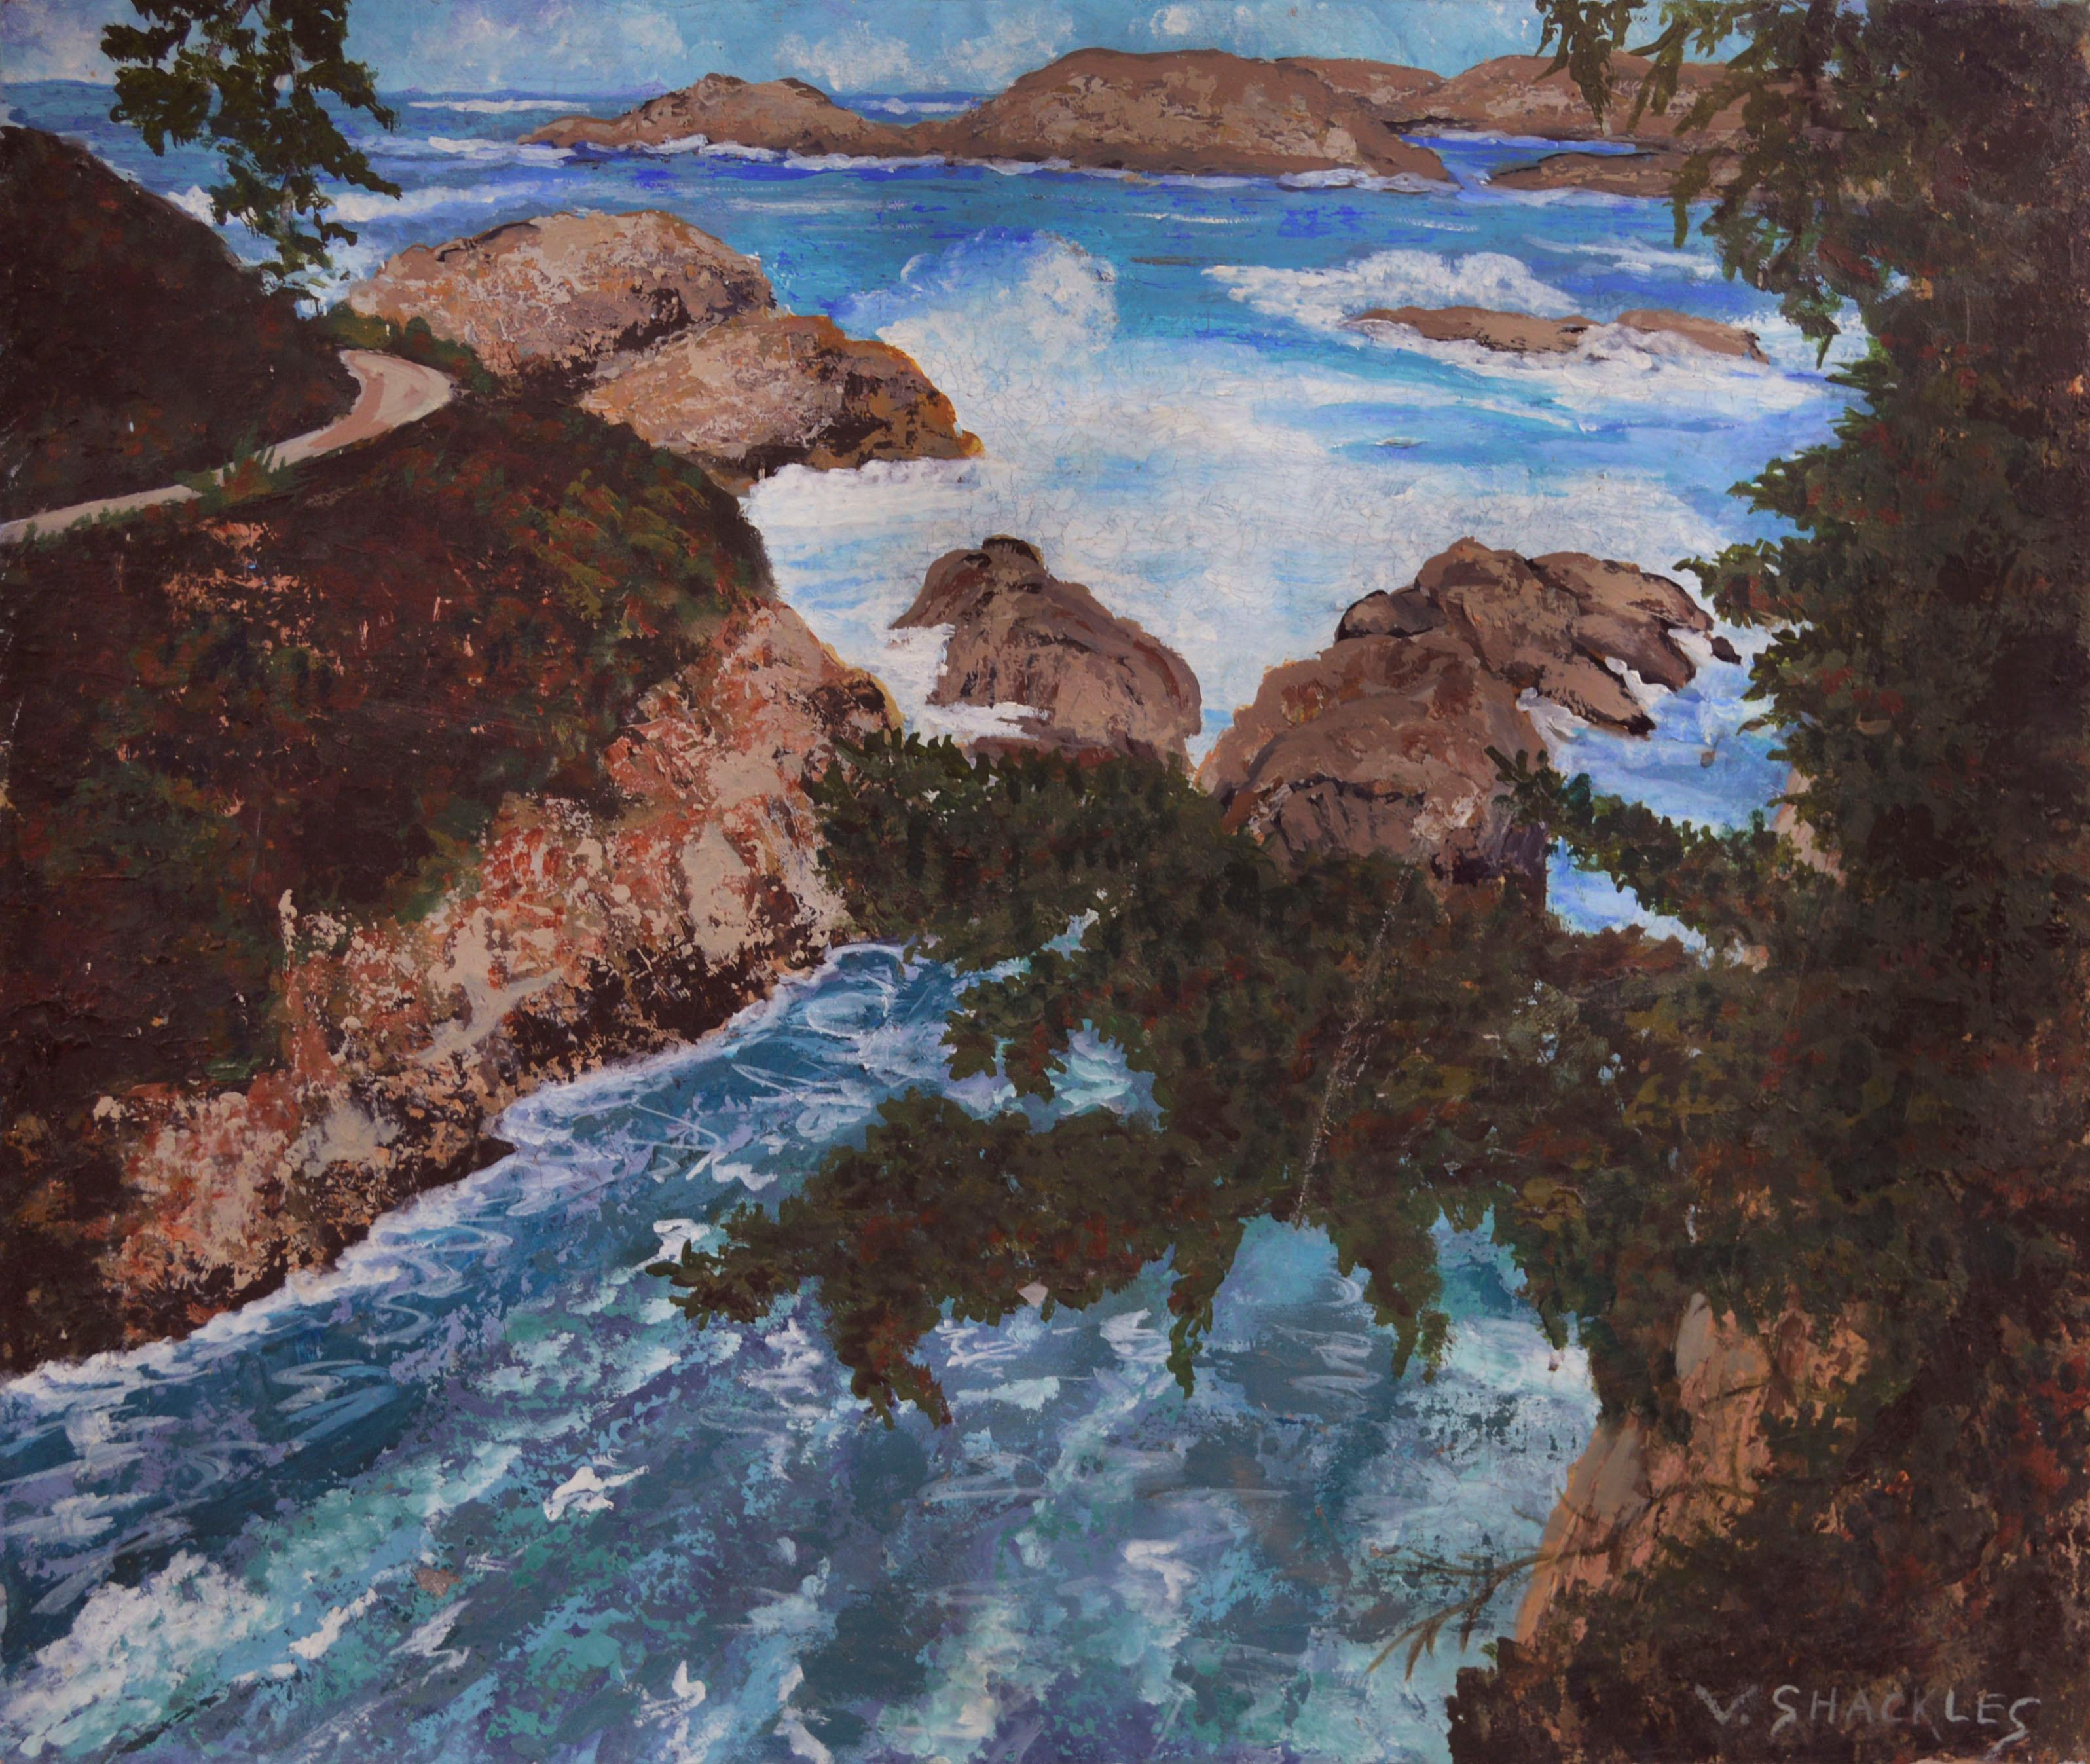 Point Lobos Cove California Coastline